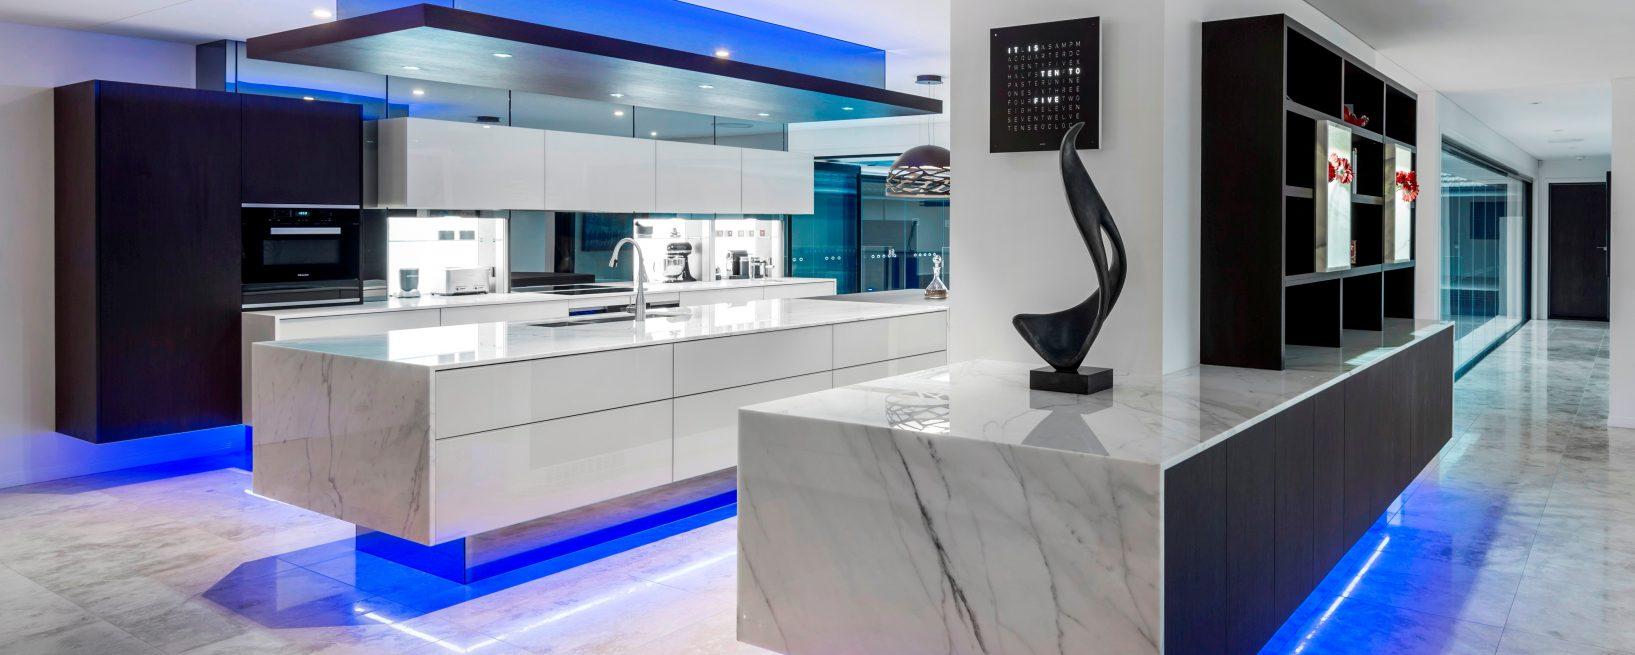 Luxury Kitchens Australia